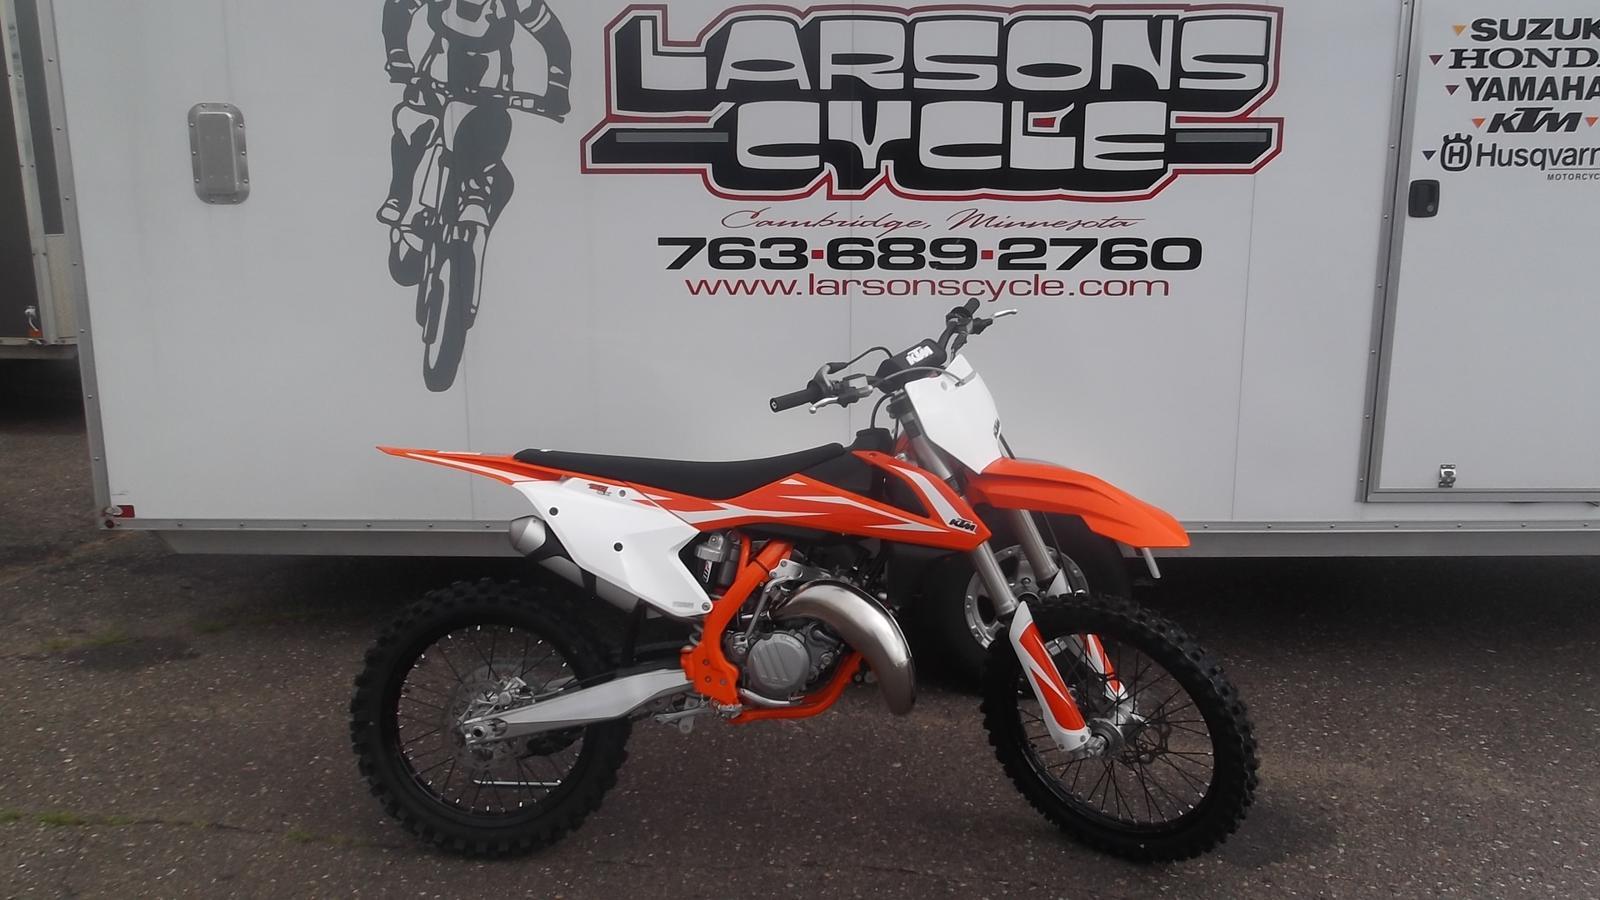 2018 ktm 150sx. perfect 2018 2018 ktm 150sx for sale in cambridge mn  larsonu0027s cycle inc 763  6892760 in ktm 150sx